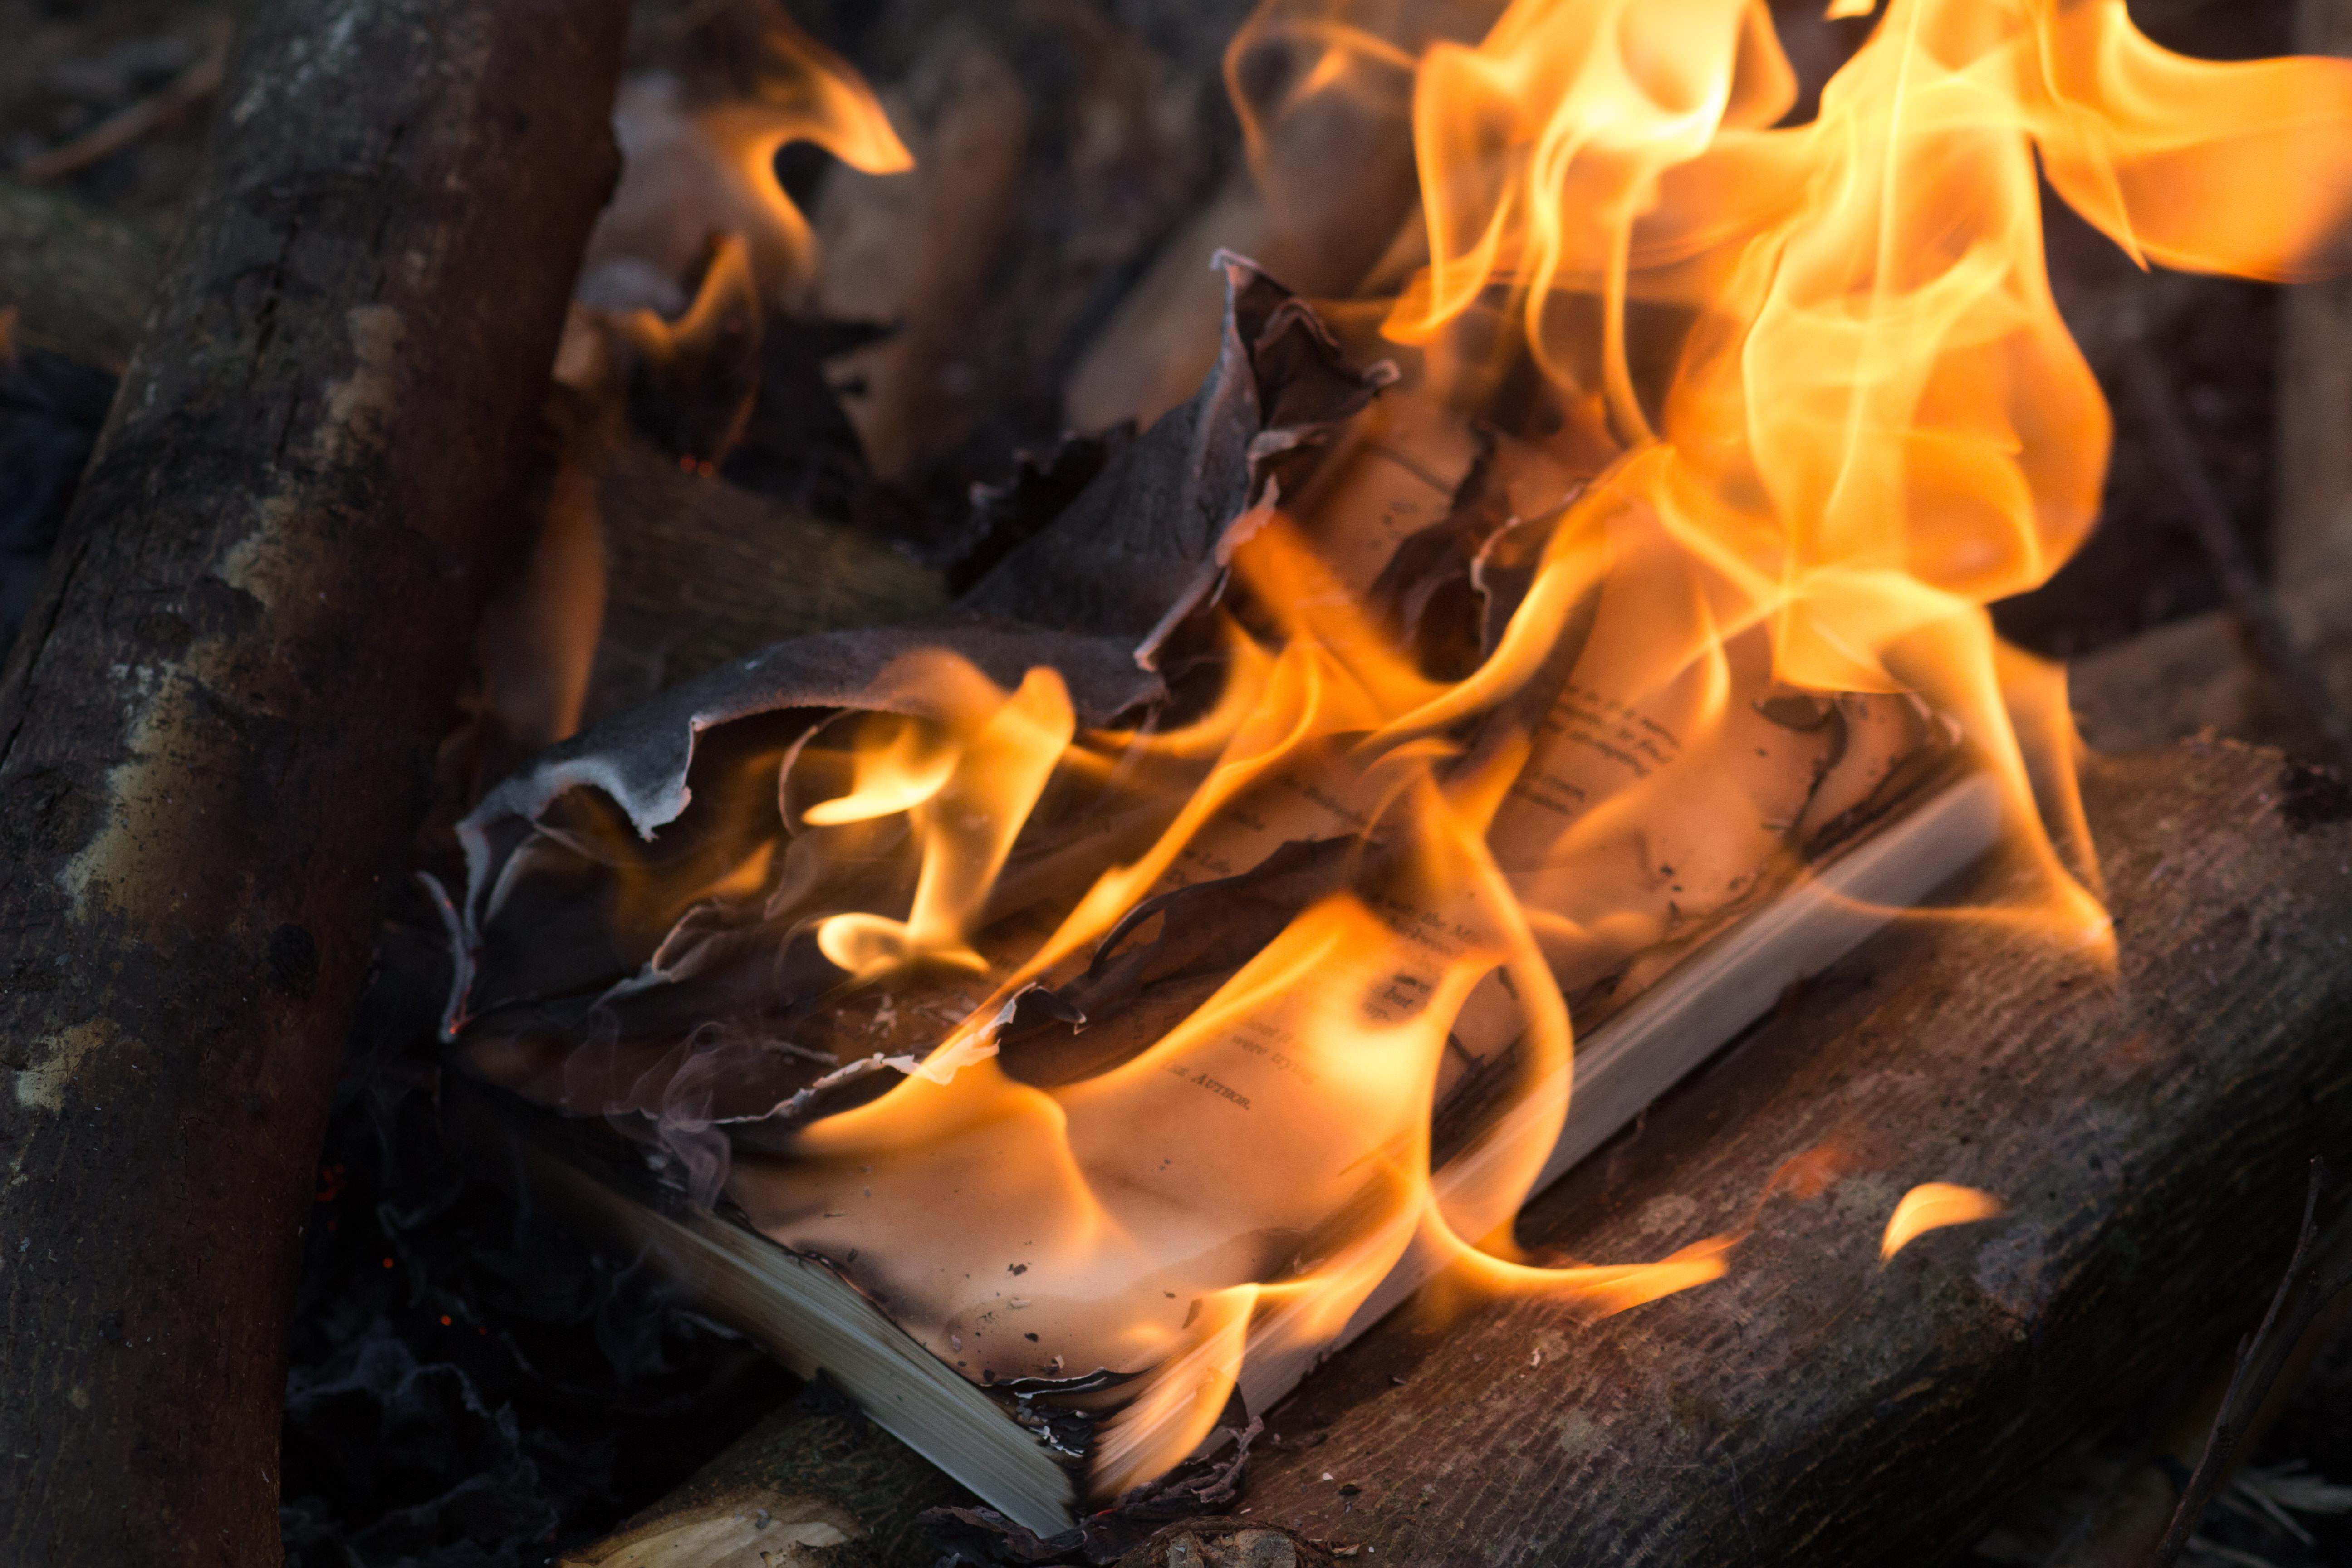 How the Blockchain Prevented Digital Book Burning